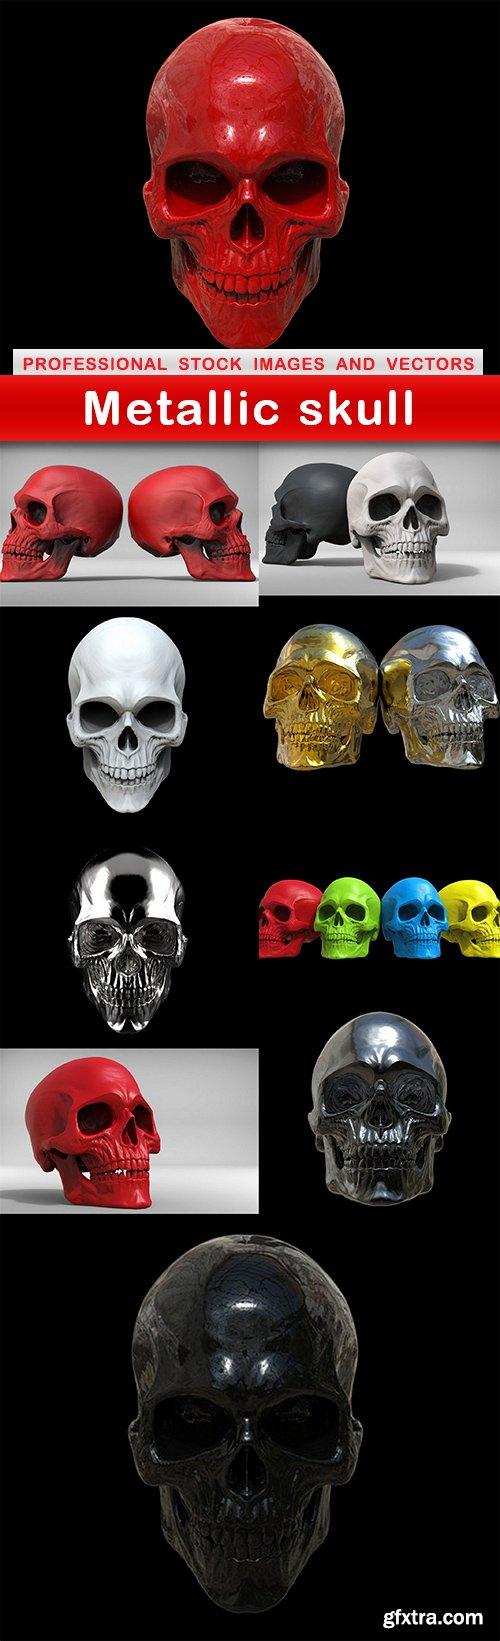 Metallic skull - 10 UHQ JPEG